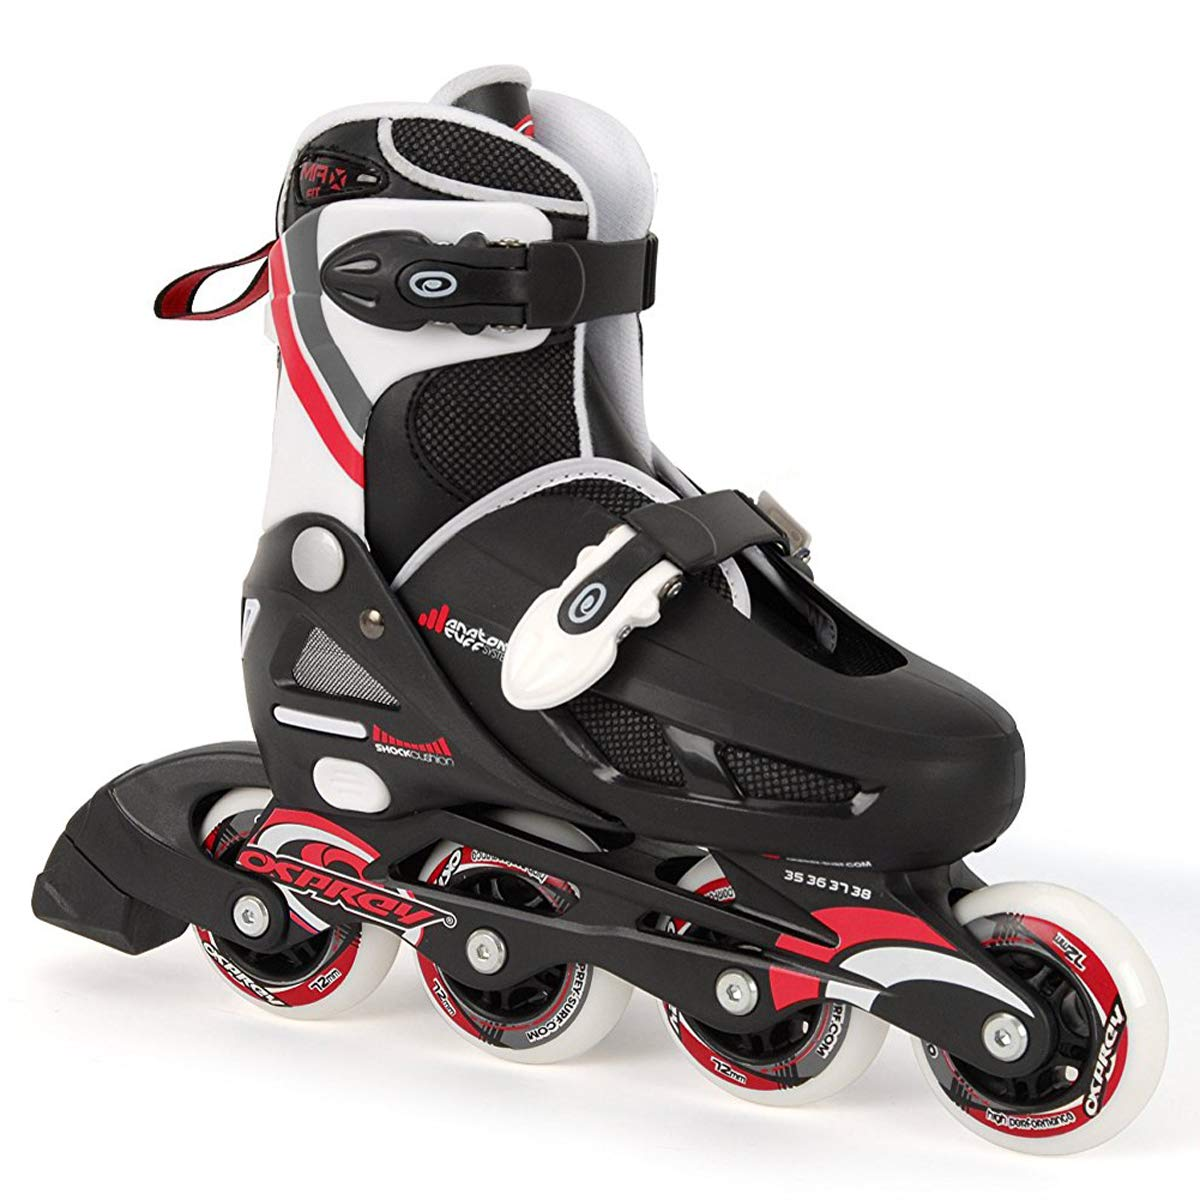 Osprey Boys Inline Skates- Patines en línea para niño